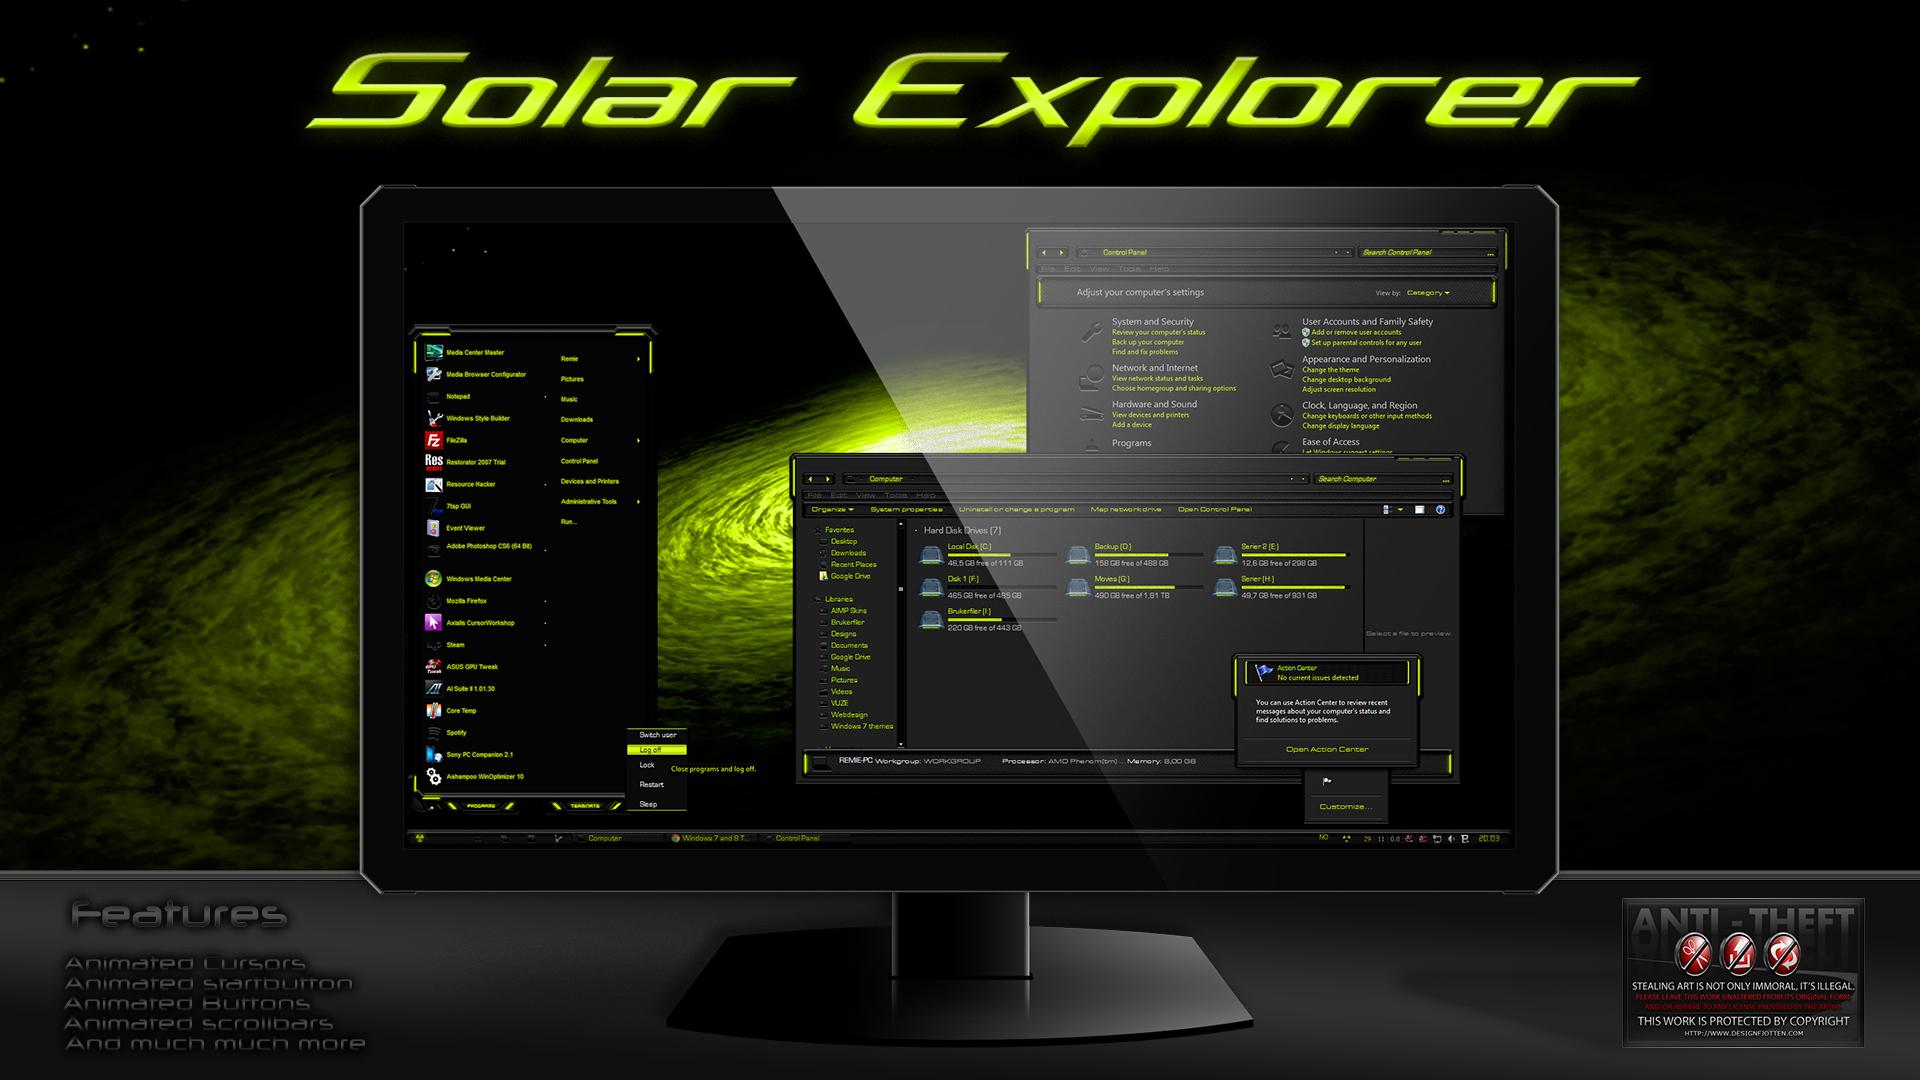 Solar Explorer Theme For Windows7 by Designfjotten